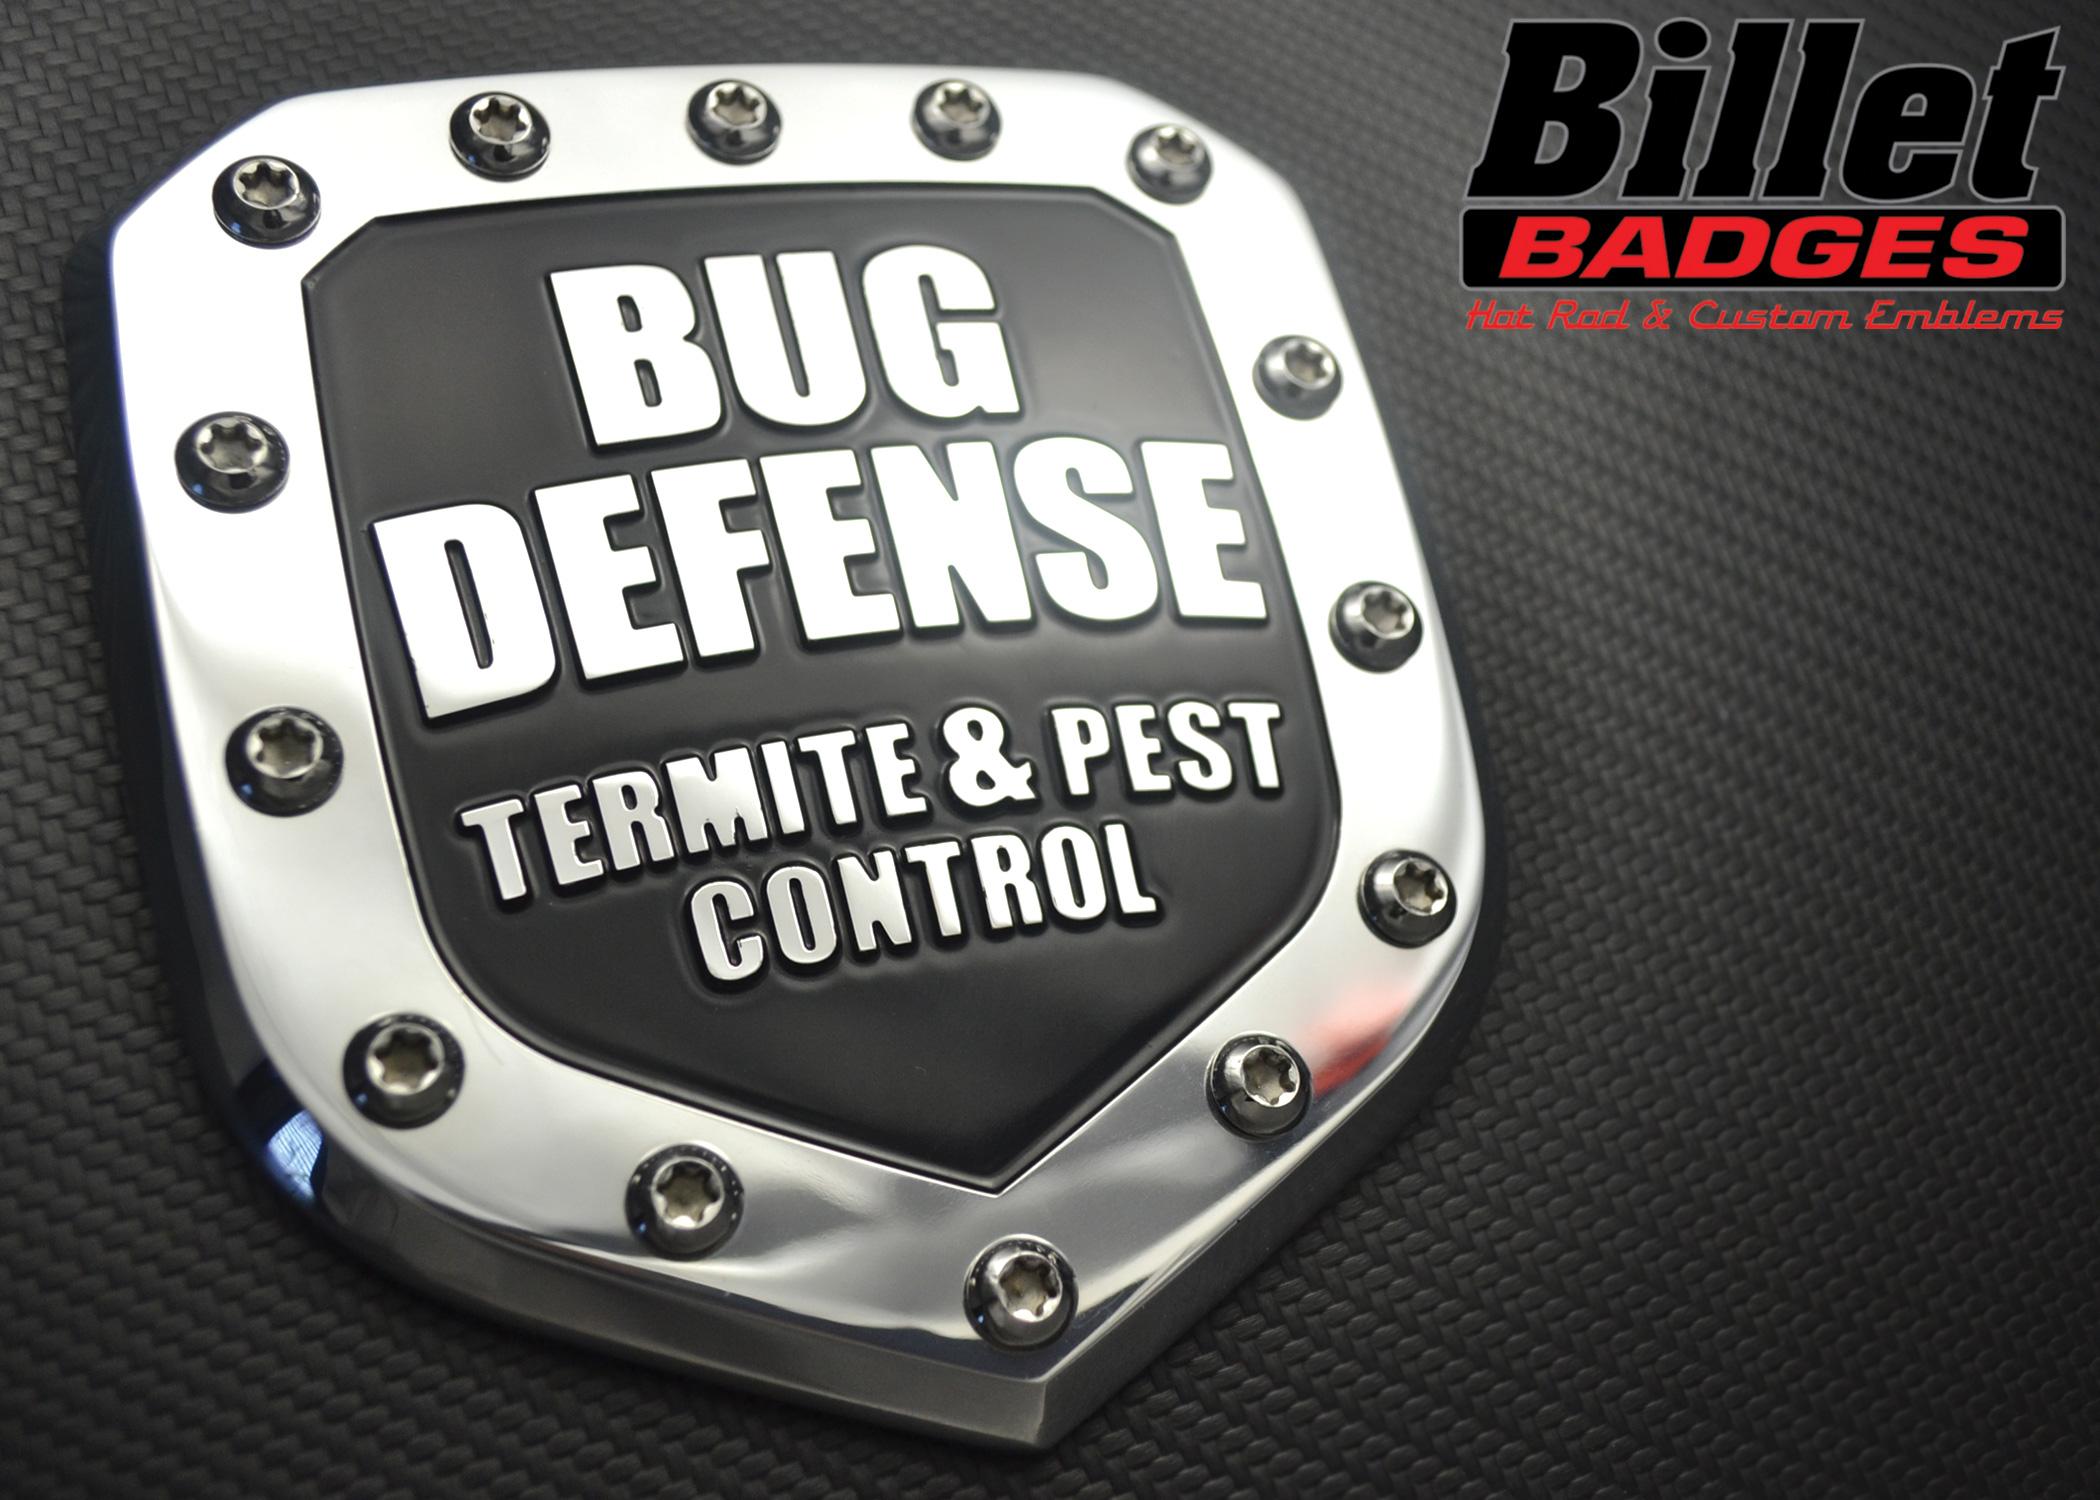 bug_defense_shield_rivet.jpg